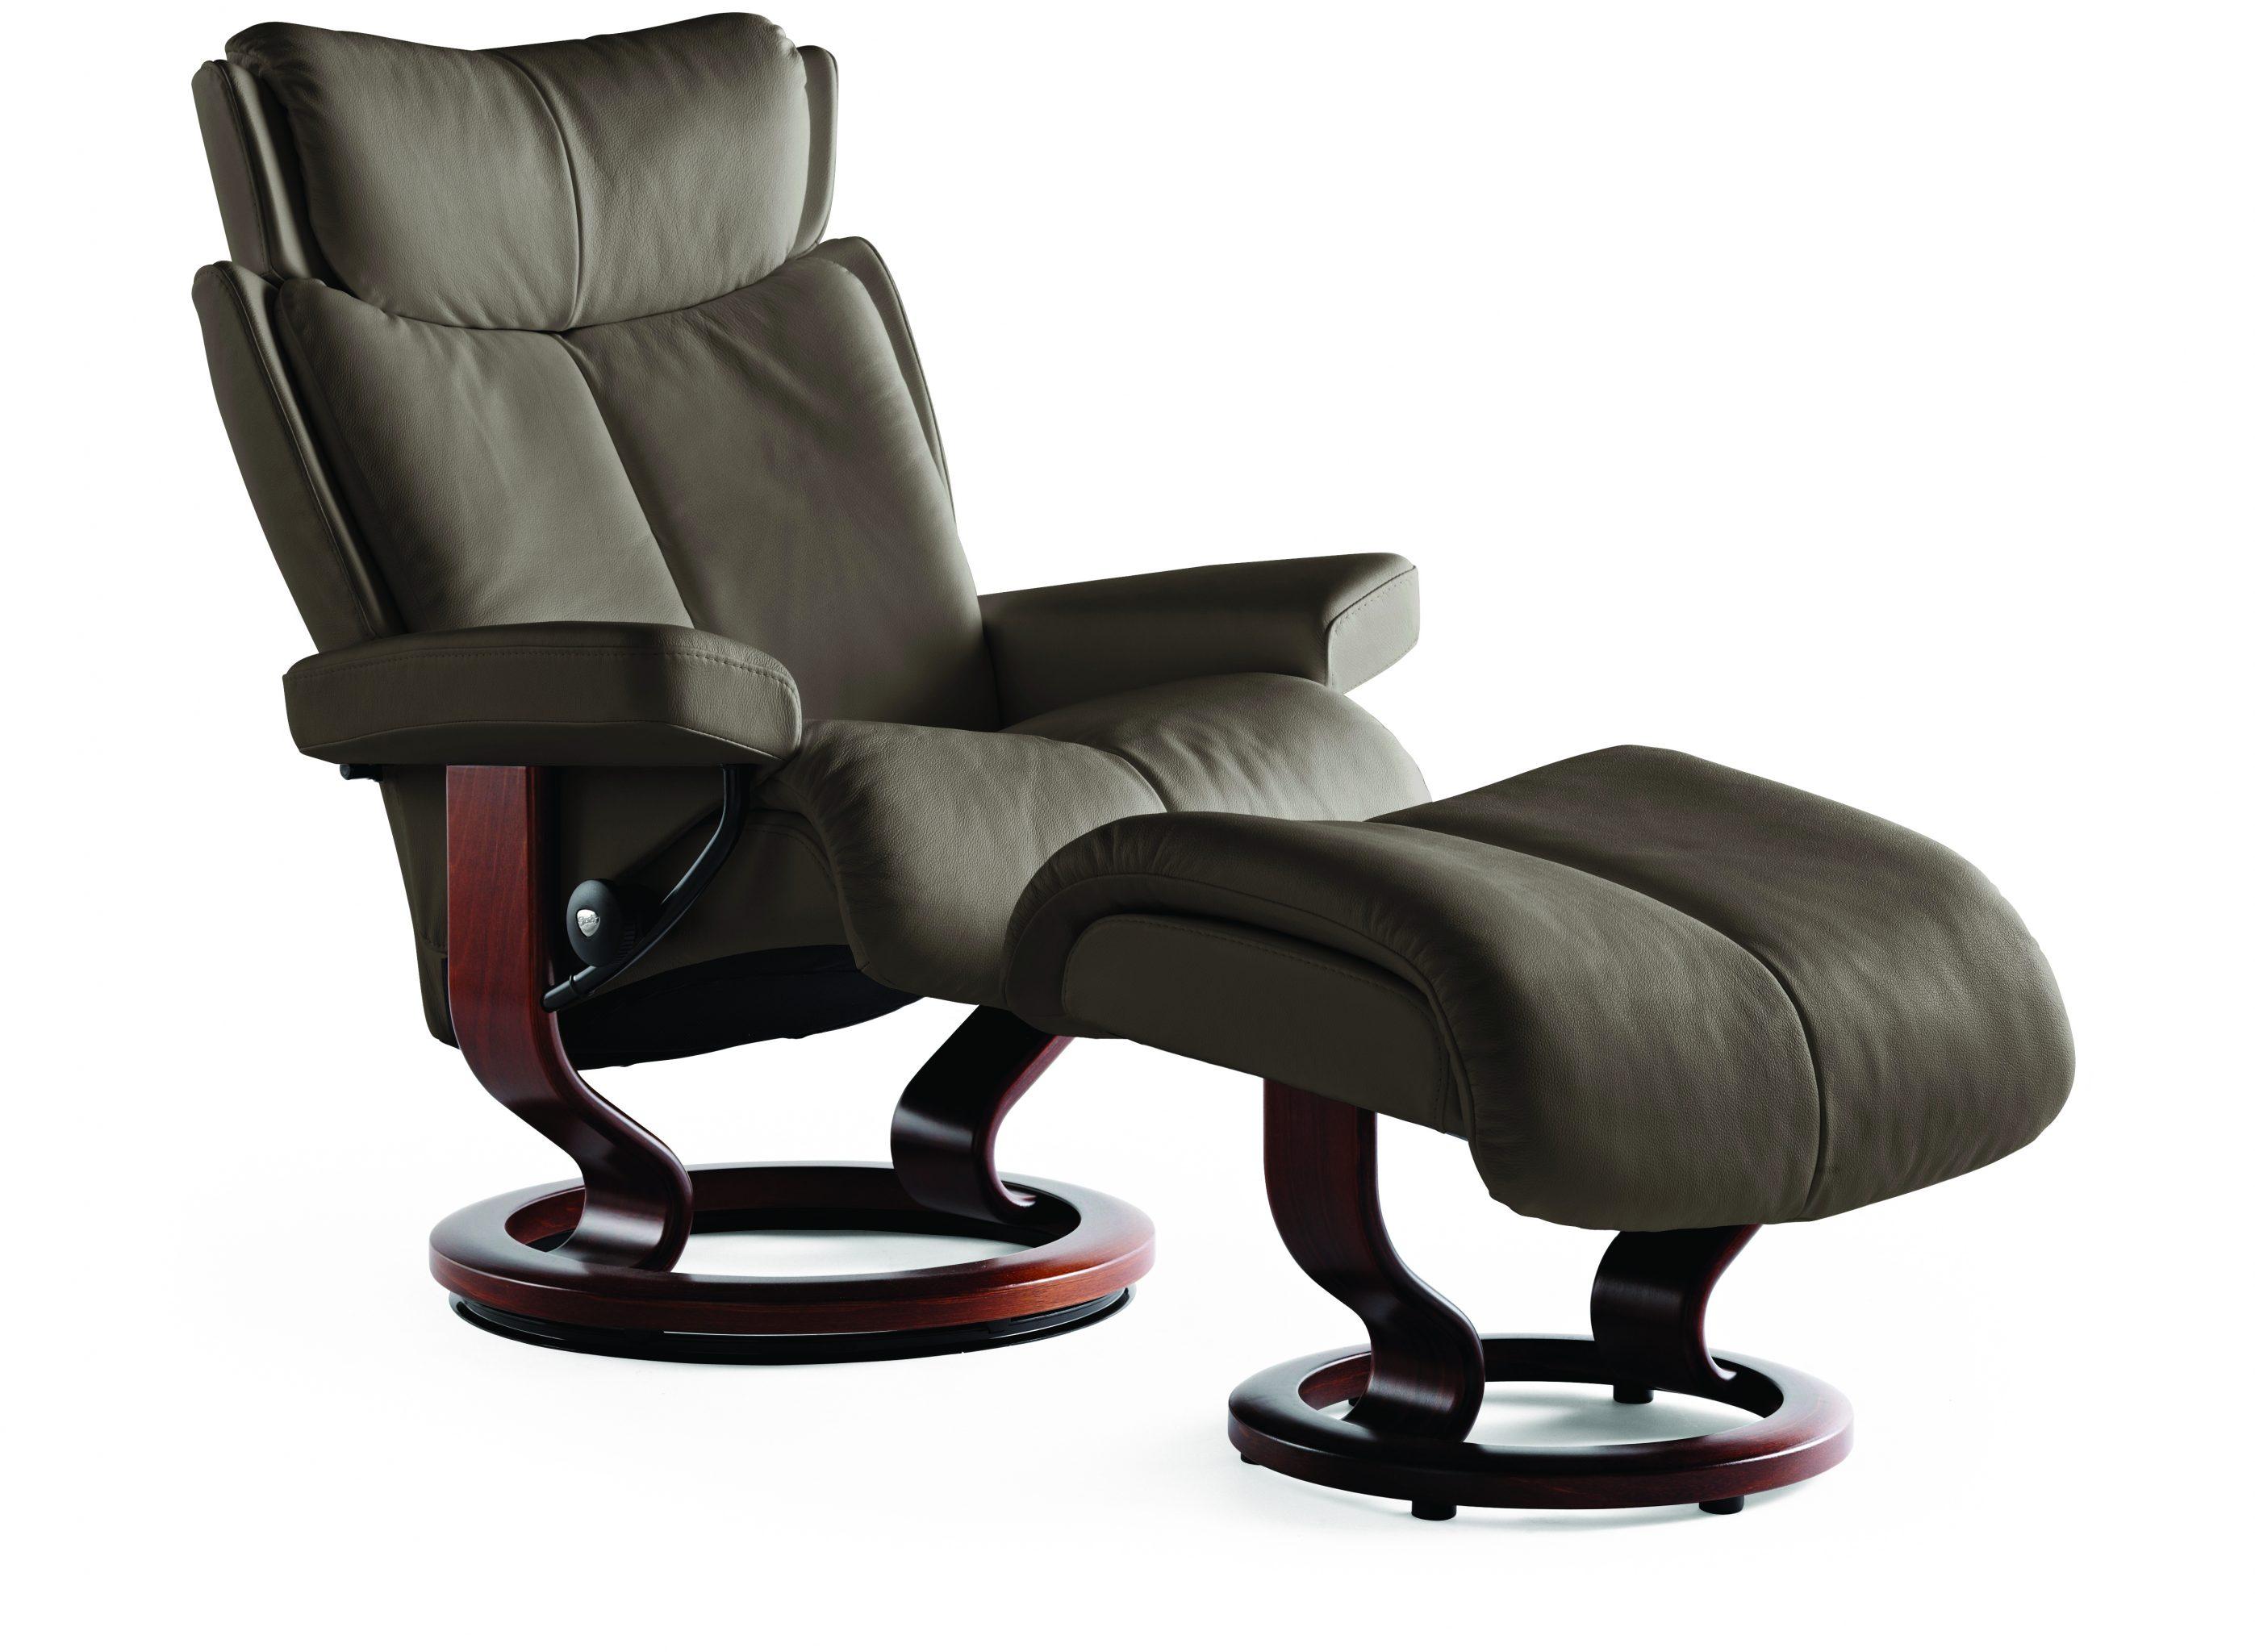 Stressless Magic Chair & Ottoman LaDiff